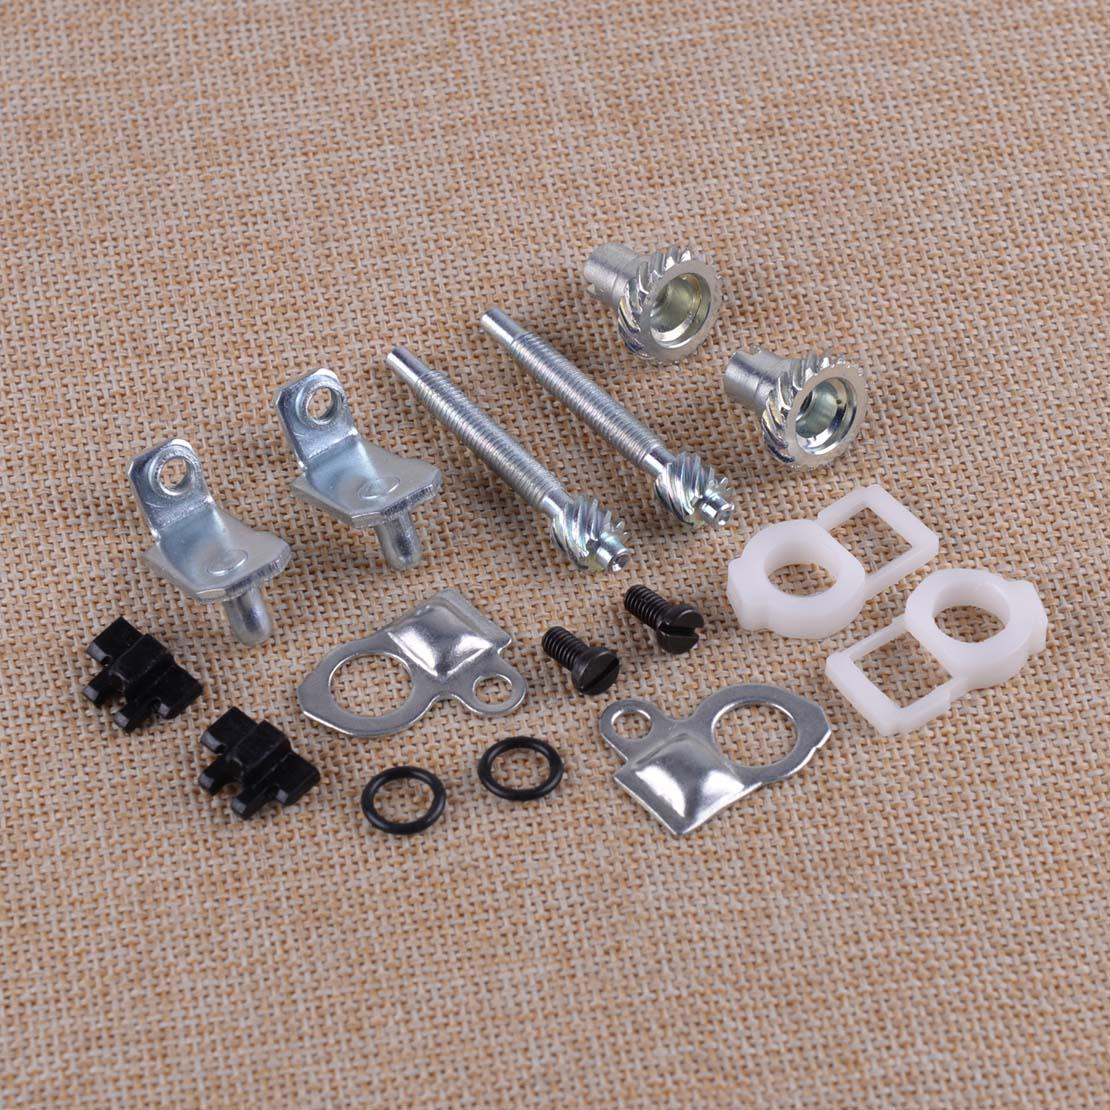 LETAOSK  2 Kit Chain Adjuster Tensioner Kit Fit For Stihl MS261 MS280 MS341 MS441 038 MS461